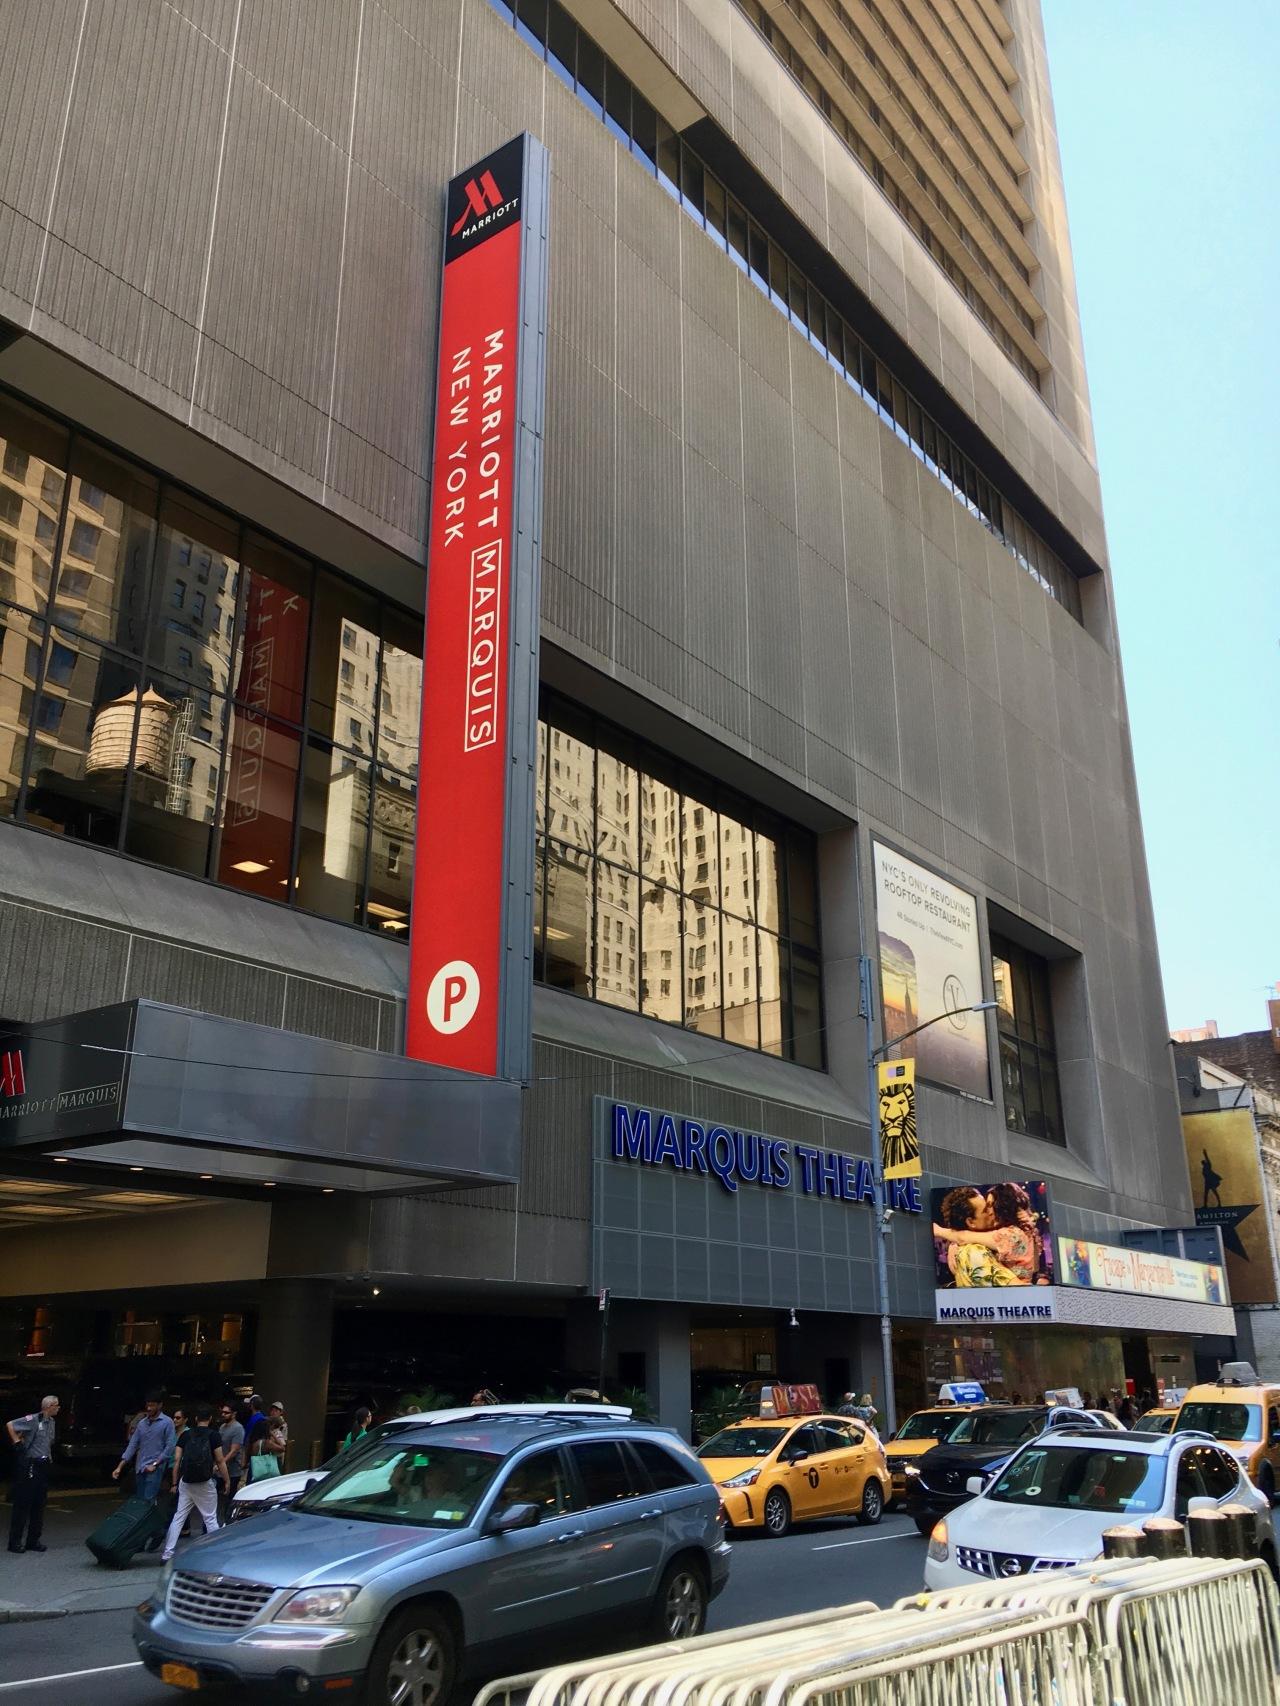 Marriott Marquis Times Square June 2018.jpg